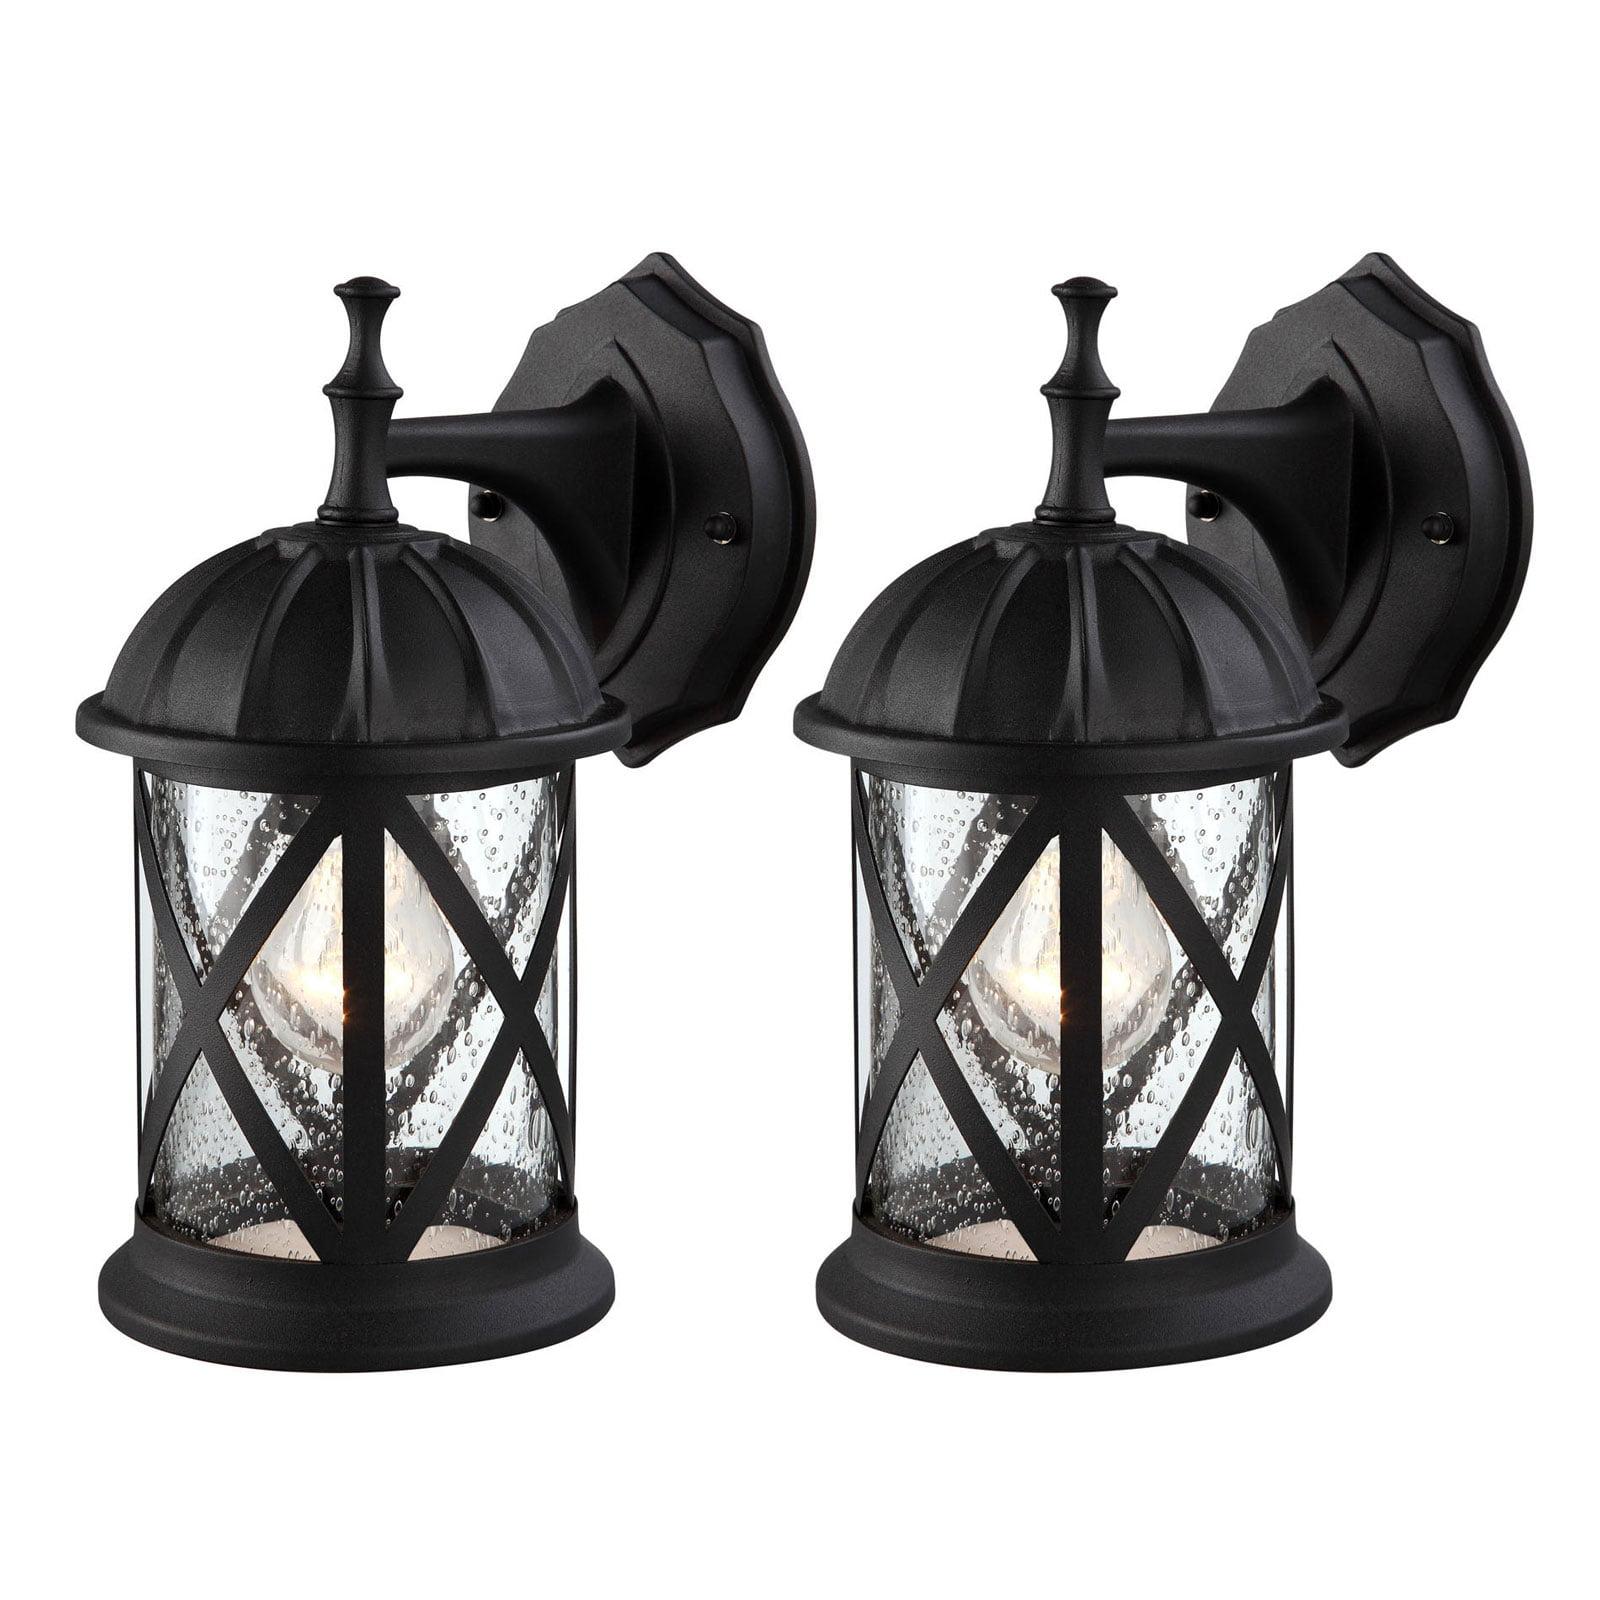 Outdoor Exterior Wall Lantern Light Fixture Sconce Twin Pack Matte Black With Seeded Glass Walmart Com Walmart Com